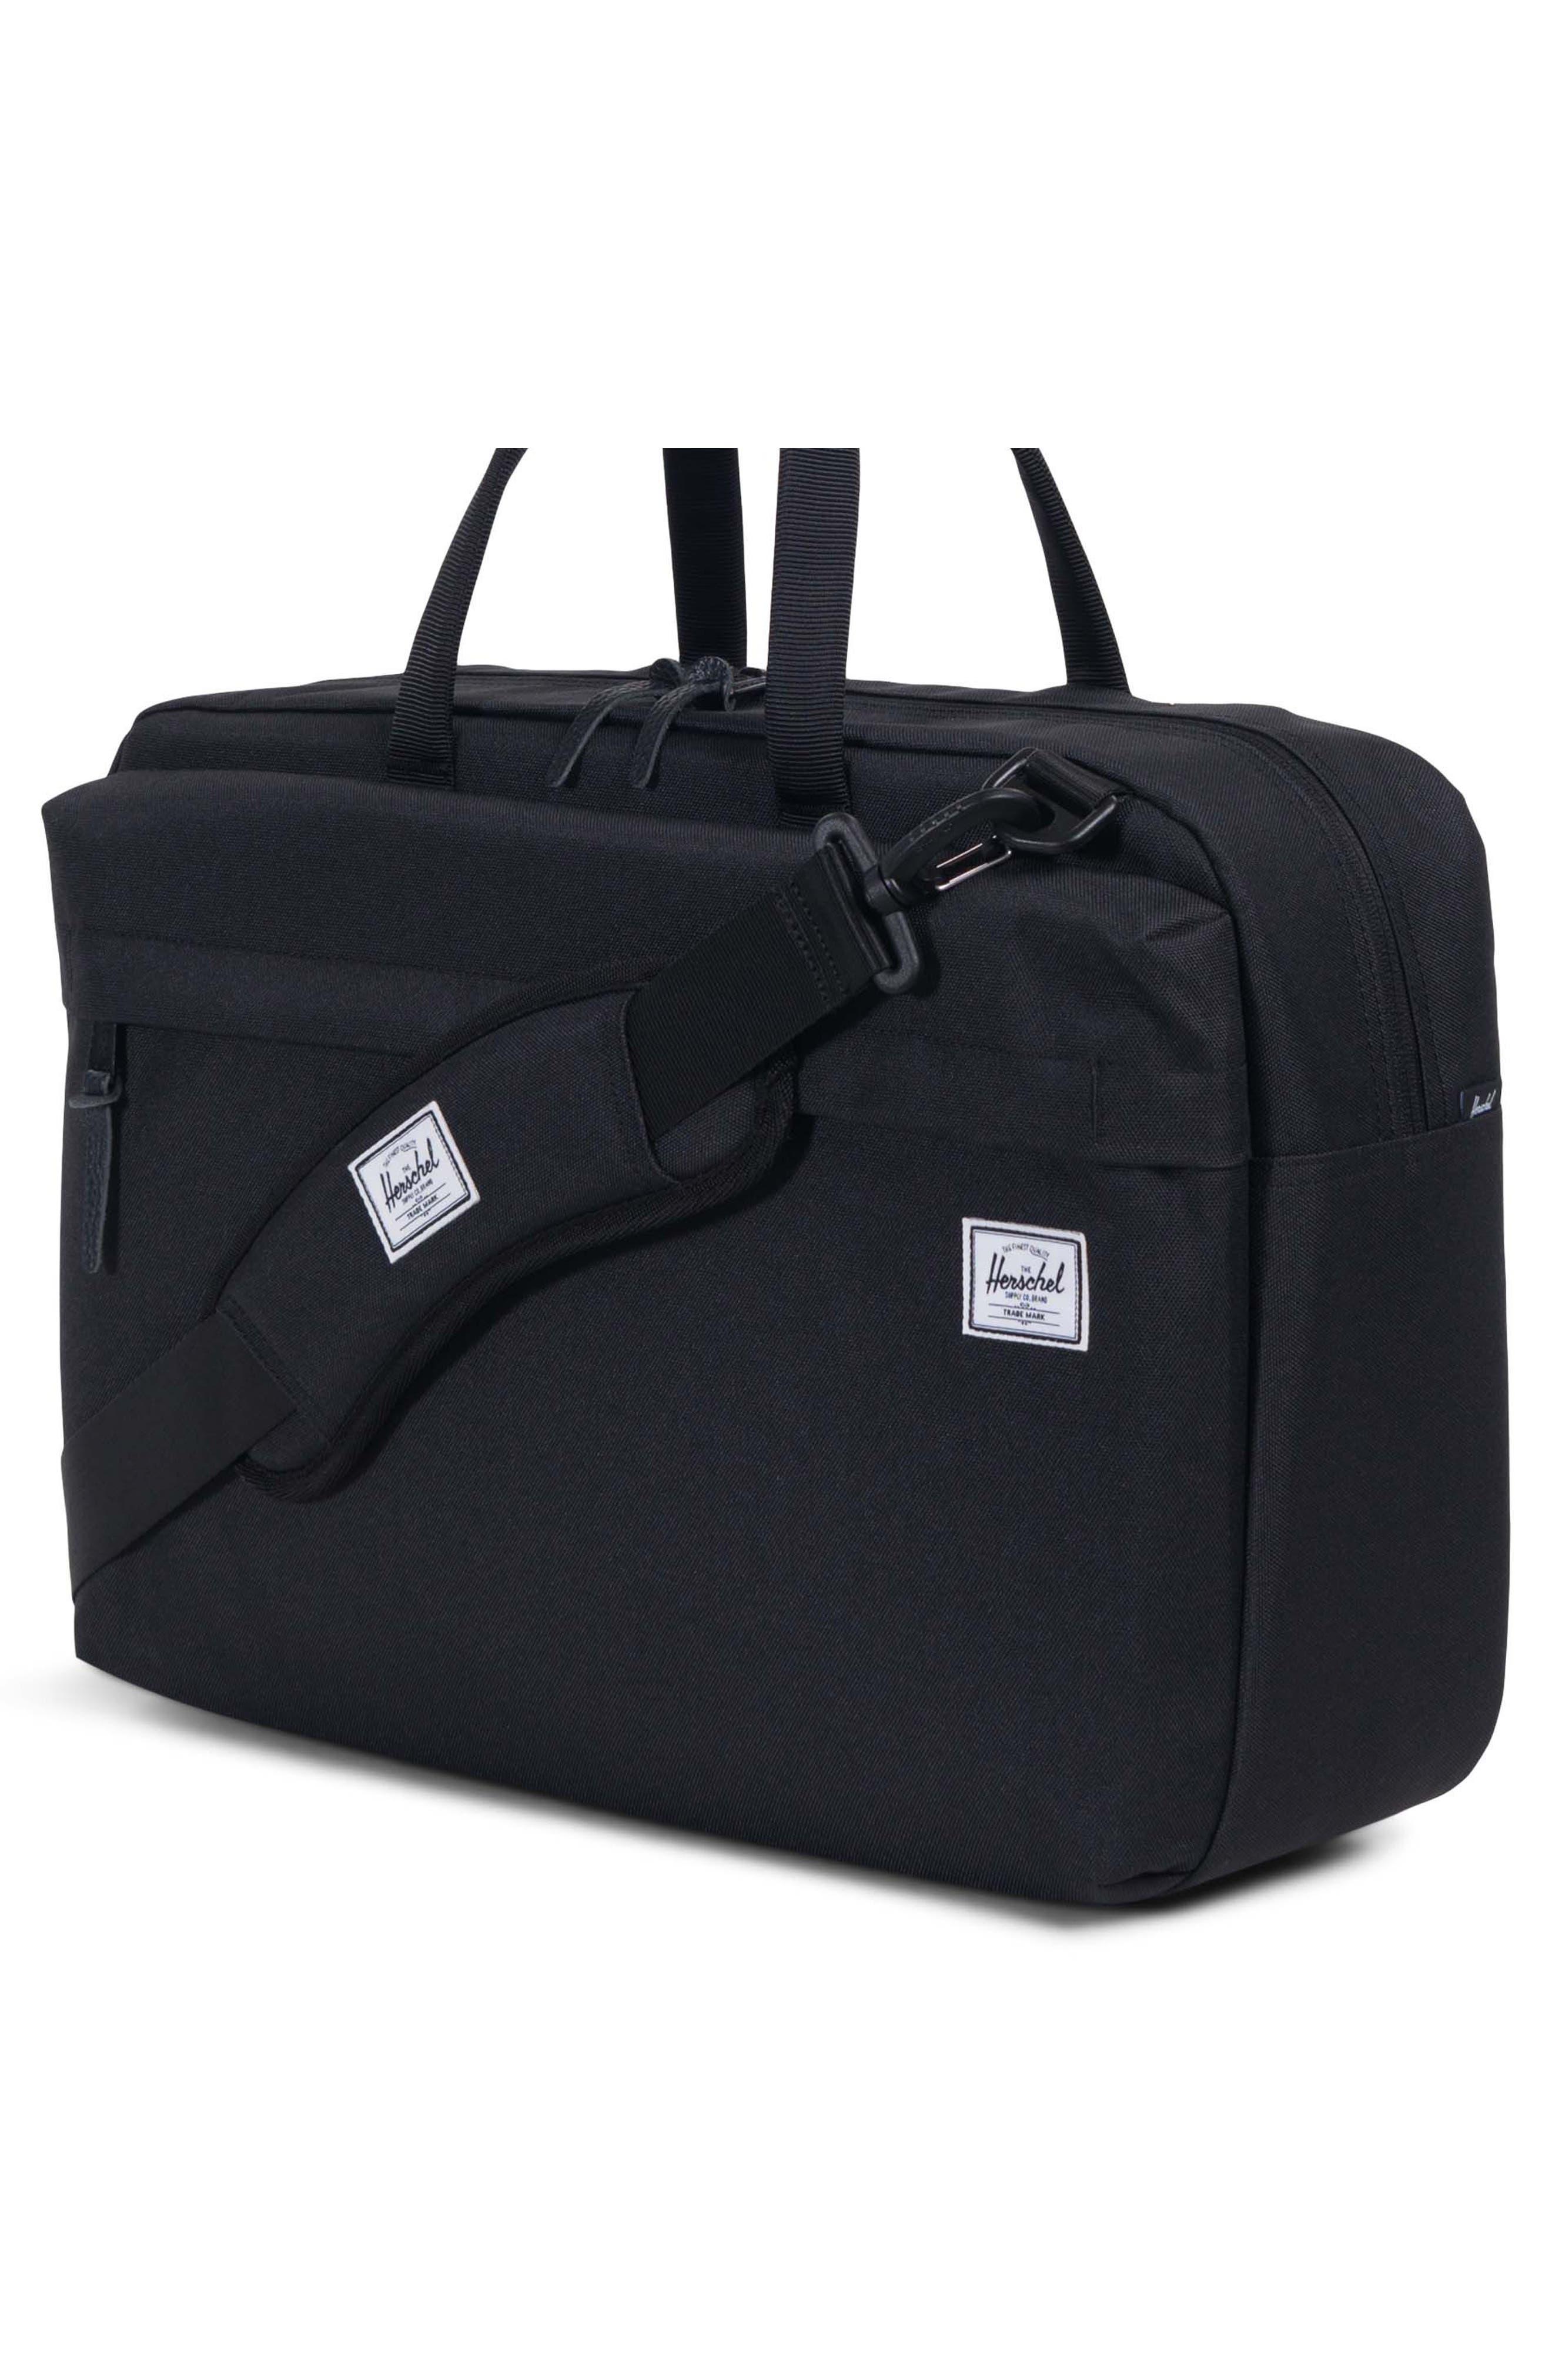 Sandford Messenger Bag,                             Alternate thumbnail 4, color,                             BLACK